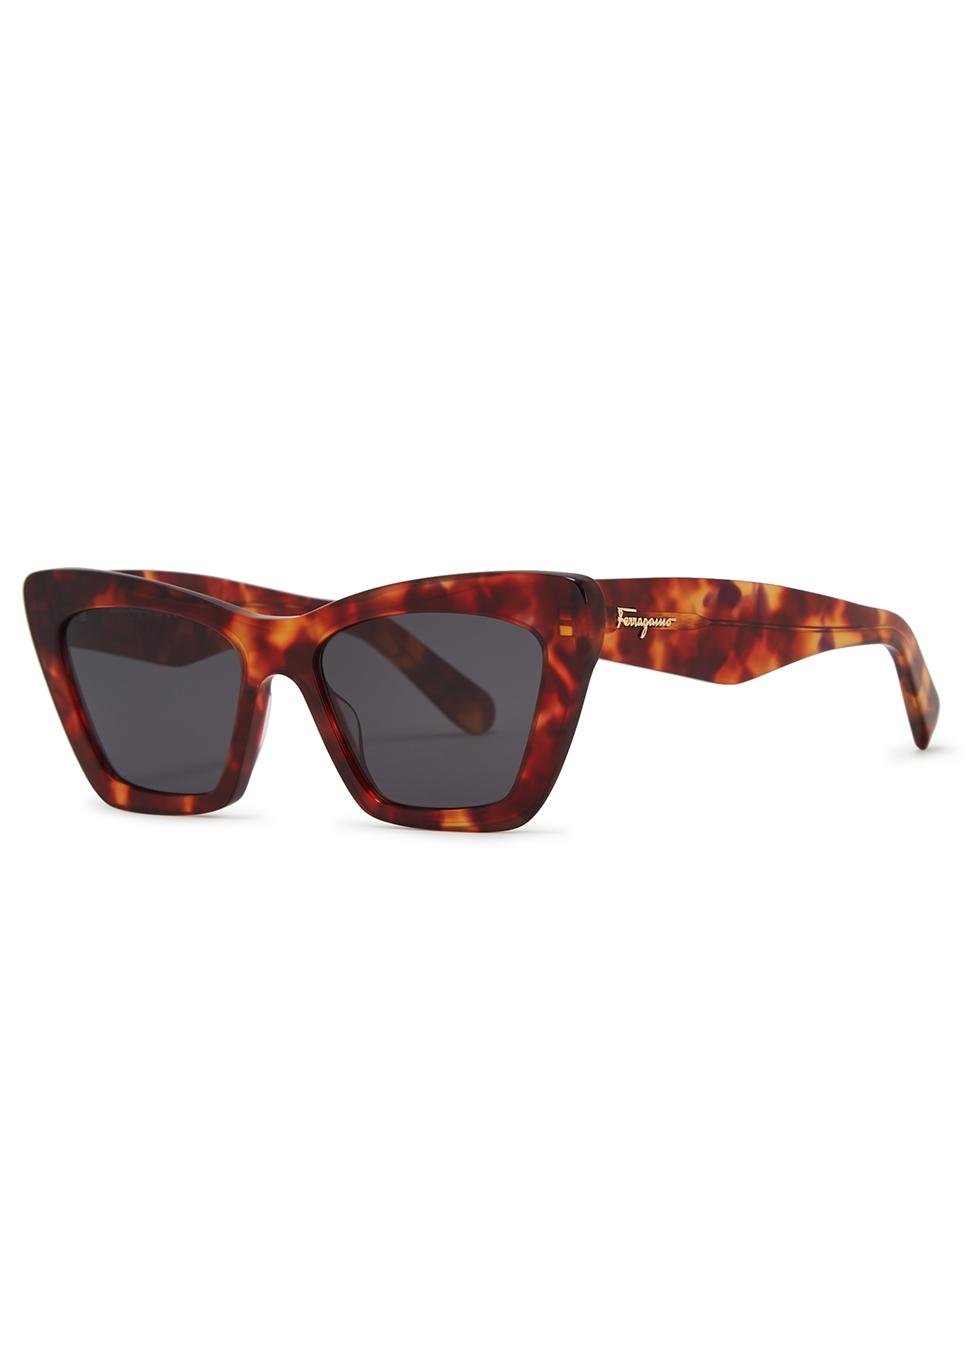 Tortoiseshell cat-eye sunglasses - Salvatore Ferragamo